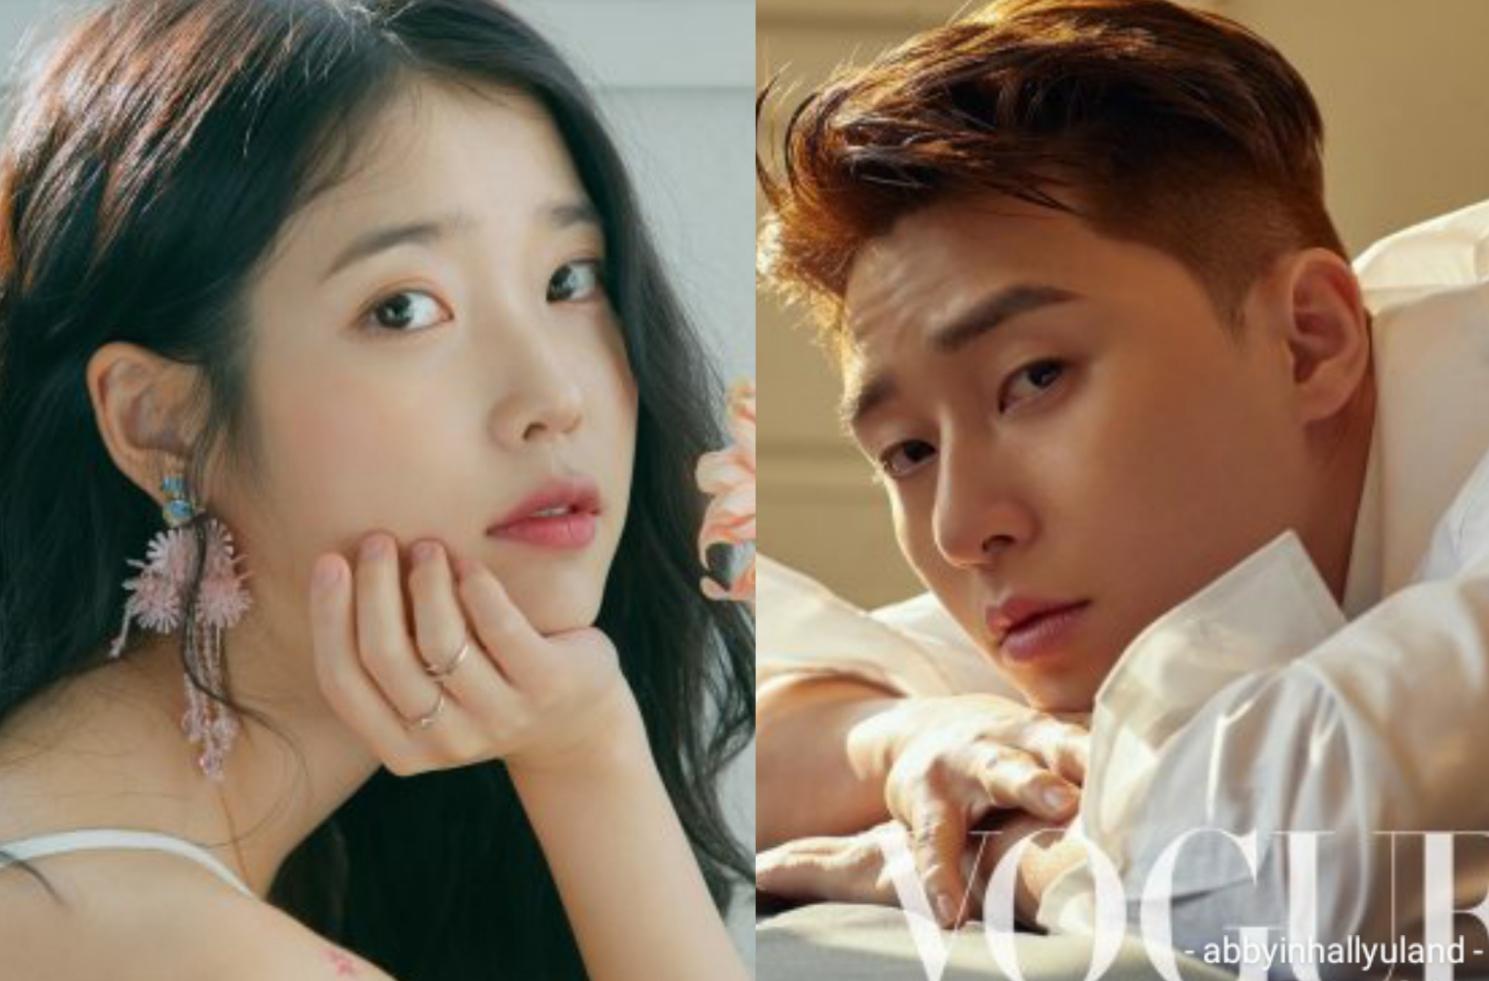 IU and Park Seo Joon